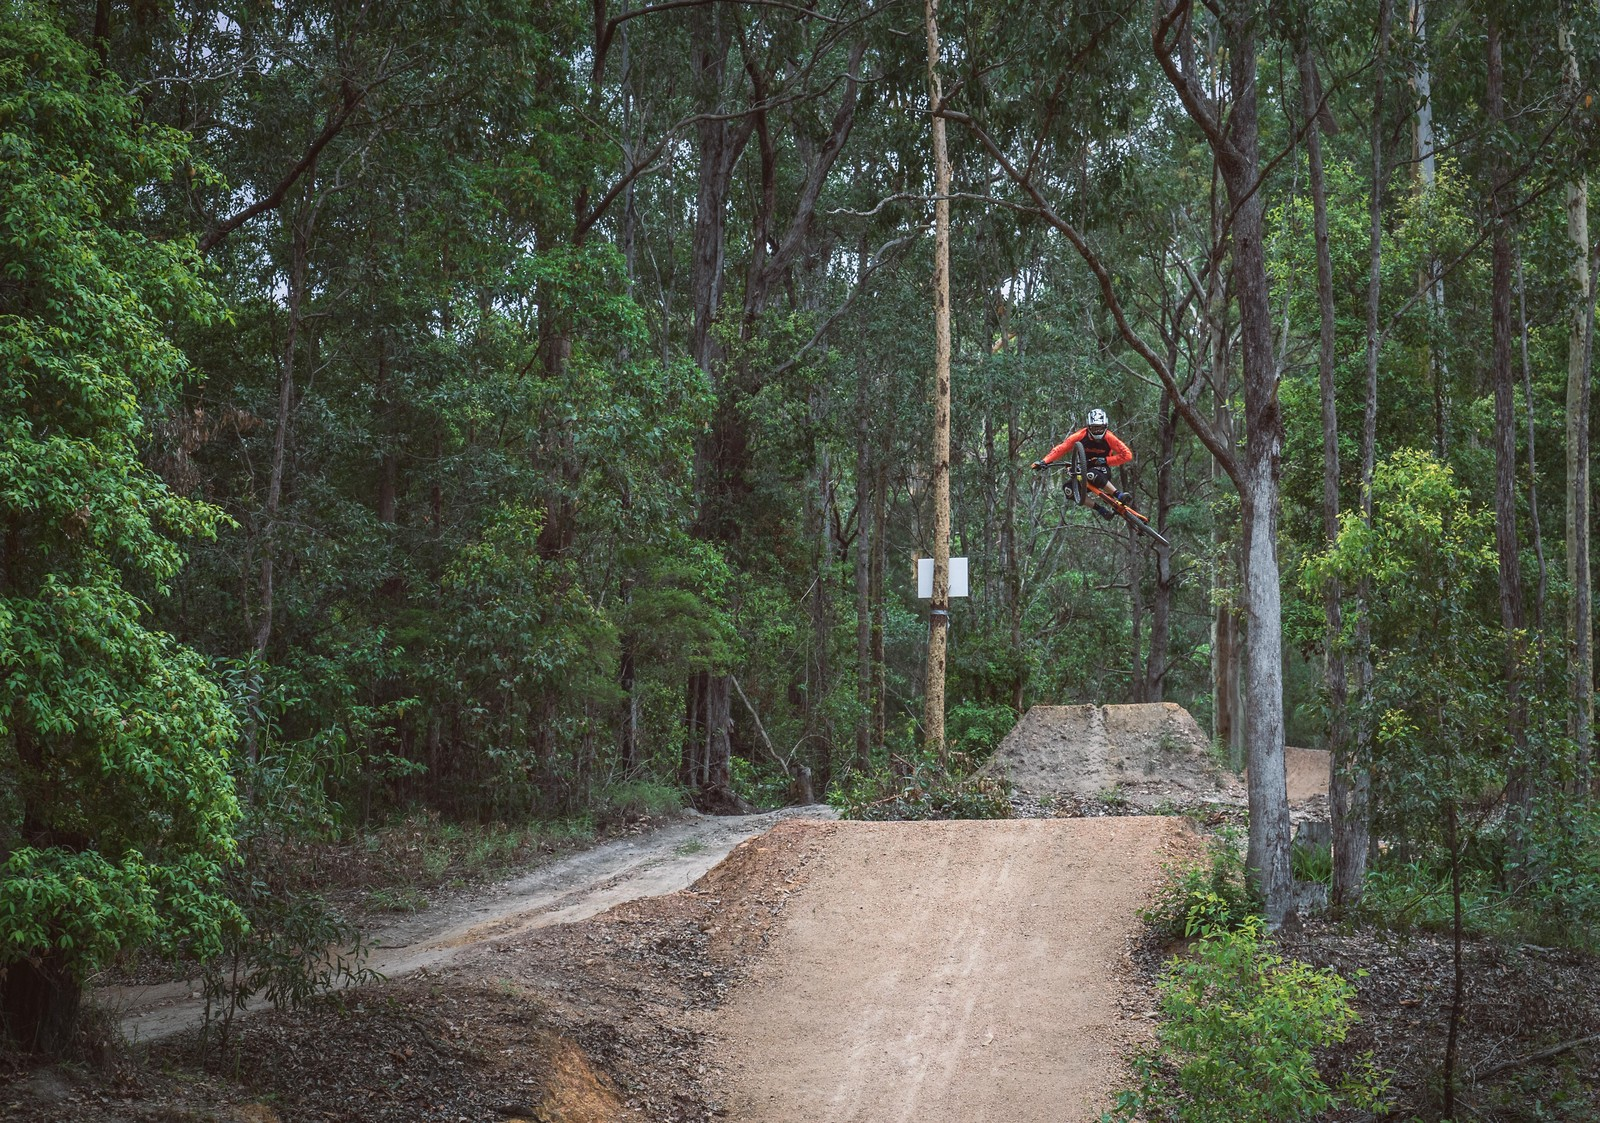 3rd jump at boomers - Zer0mtb - Mountain Biking Pictures - Vital MTB